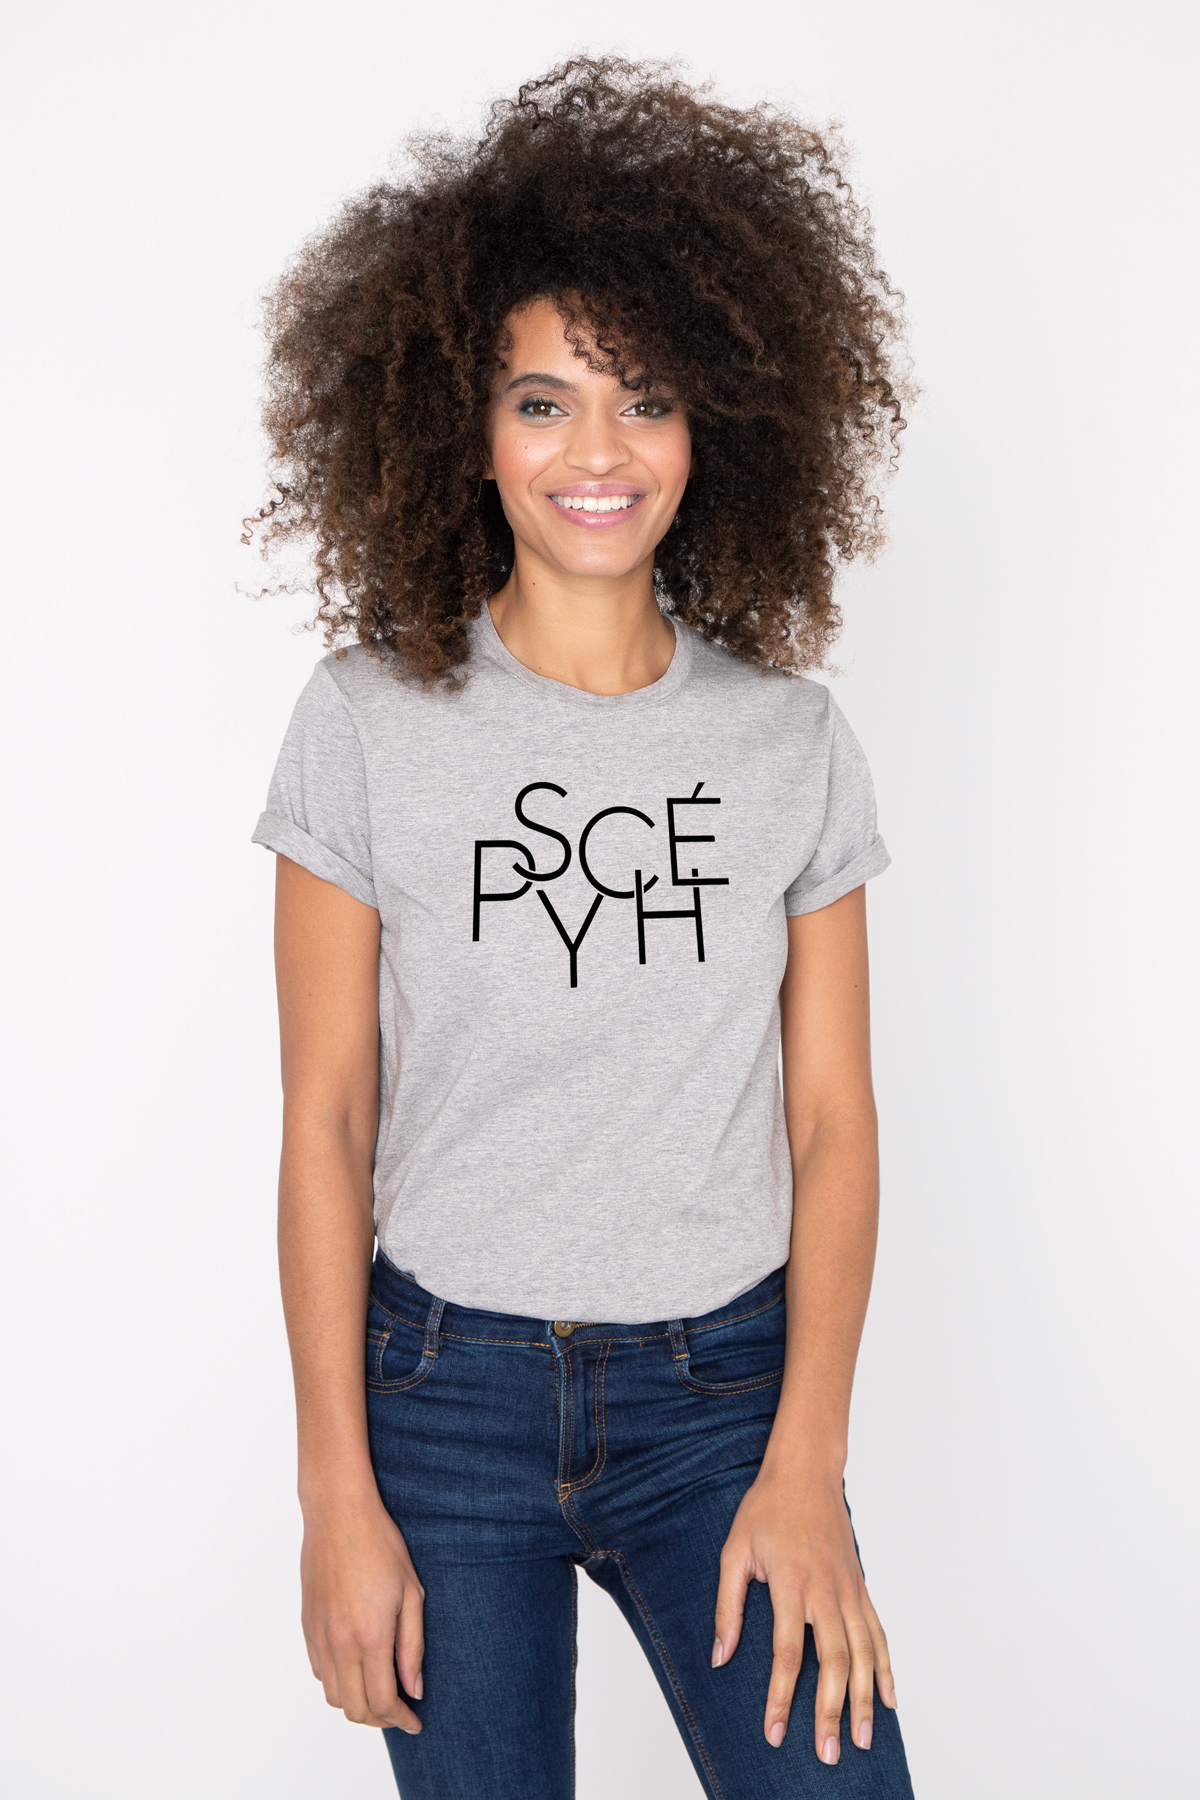 Photo de T-SHIRTS COL ROND Tshirt PSYCHE chez French Disorder